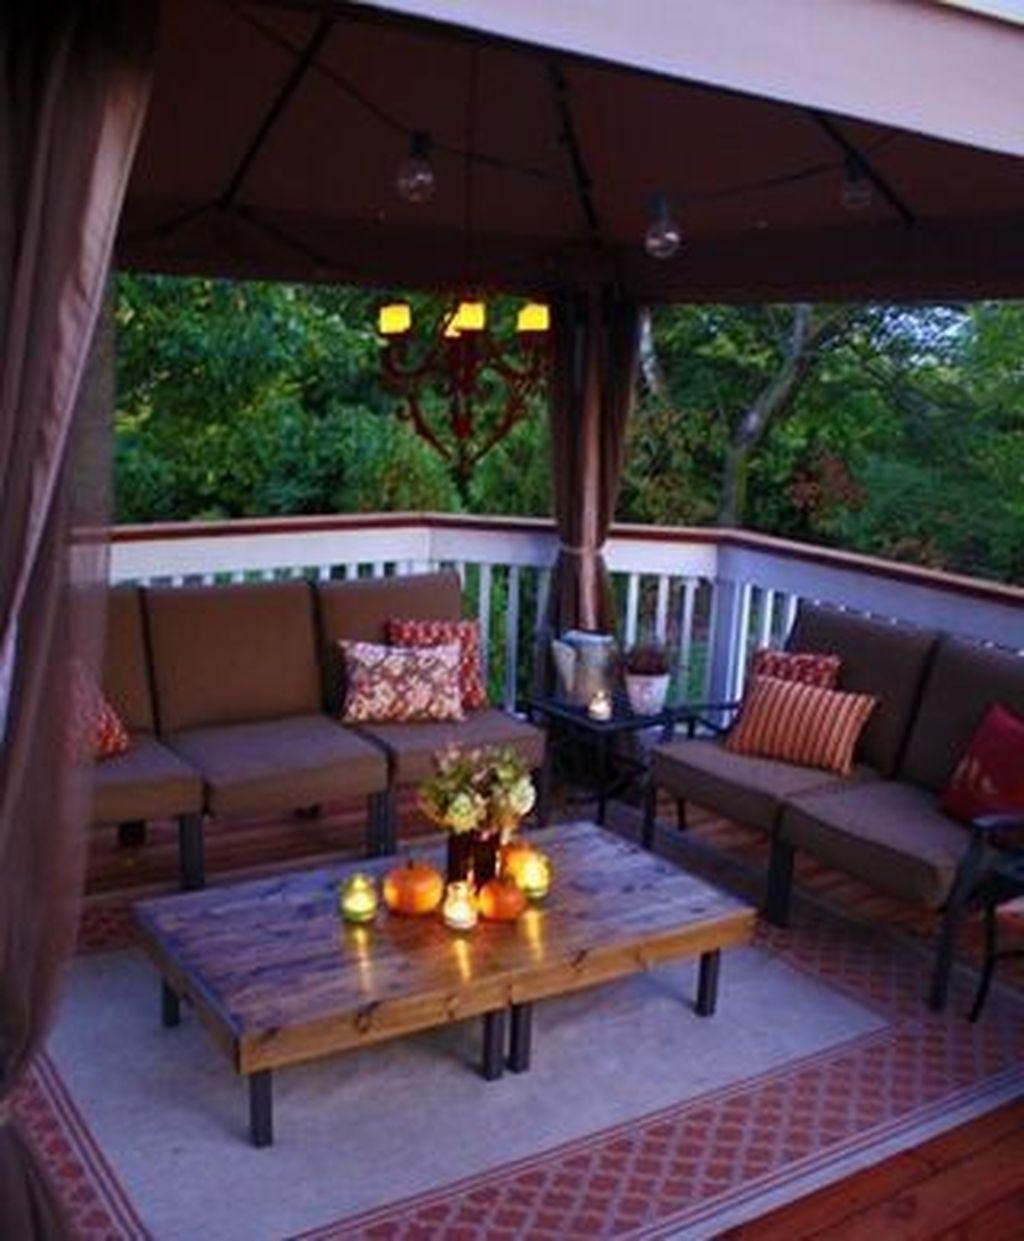 34 Amazing Outdoor Deck Lighting Ideas Small Deck Decorating Ideas Deck Decorating Decks Backyard